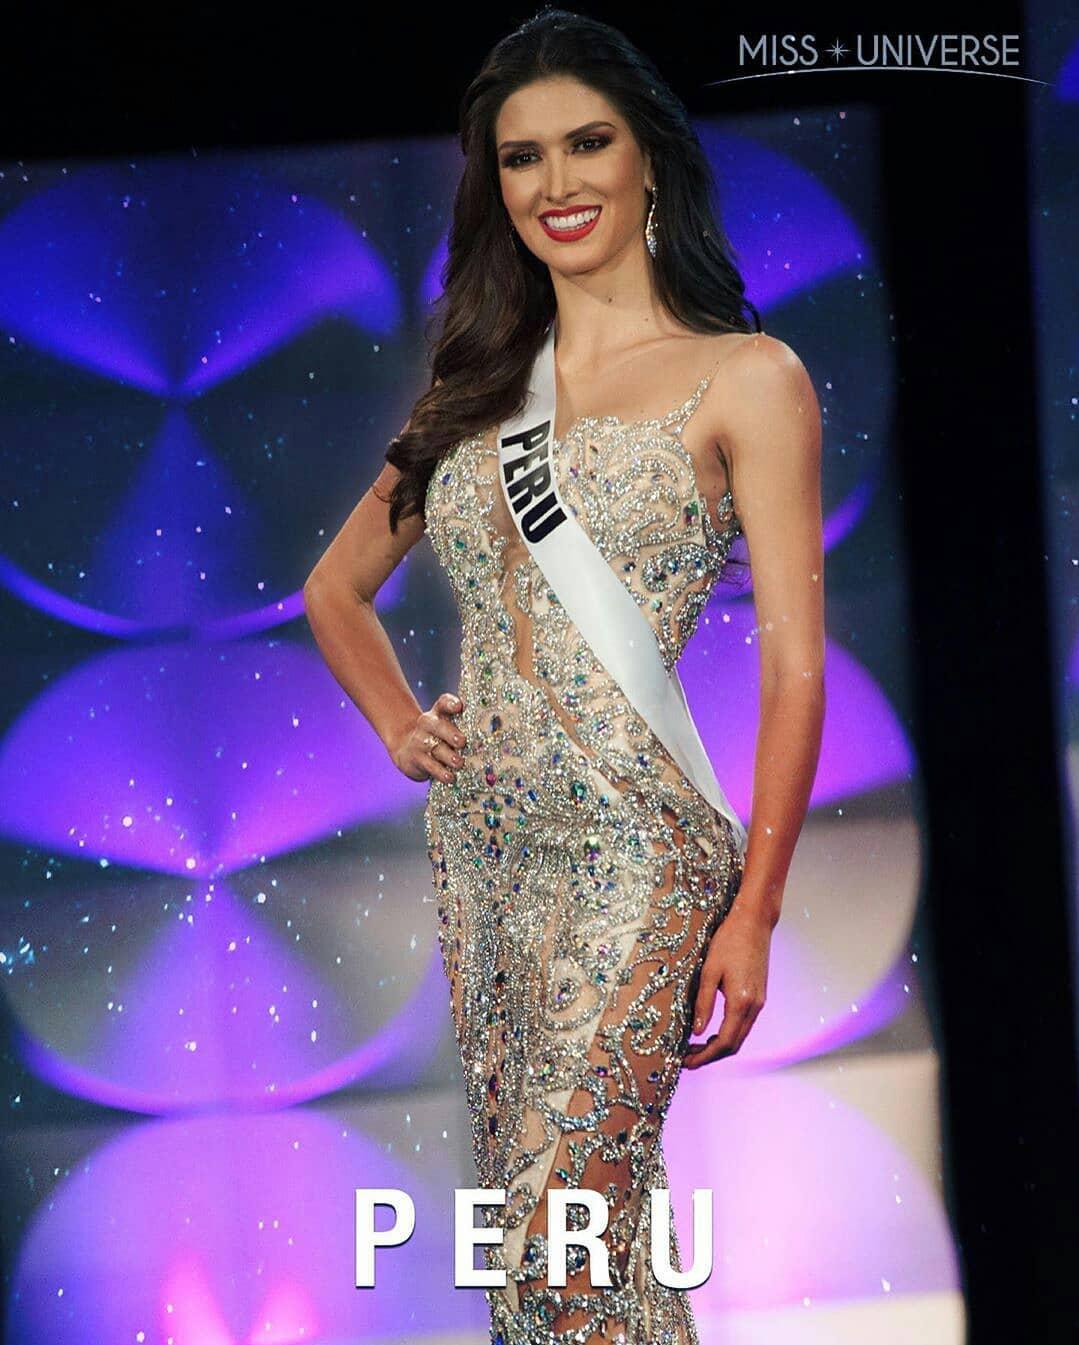 kelin rivera kroll, top 10 de miss universe 2019/2nd runner-up de miss eco international 2018/world miss university 2016. - Página 17 78843610